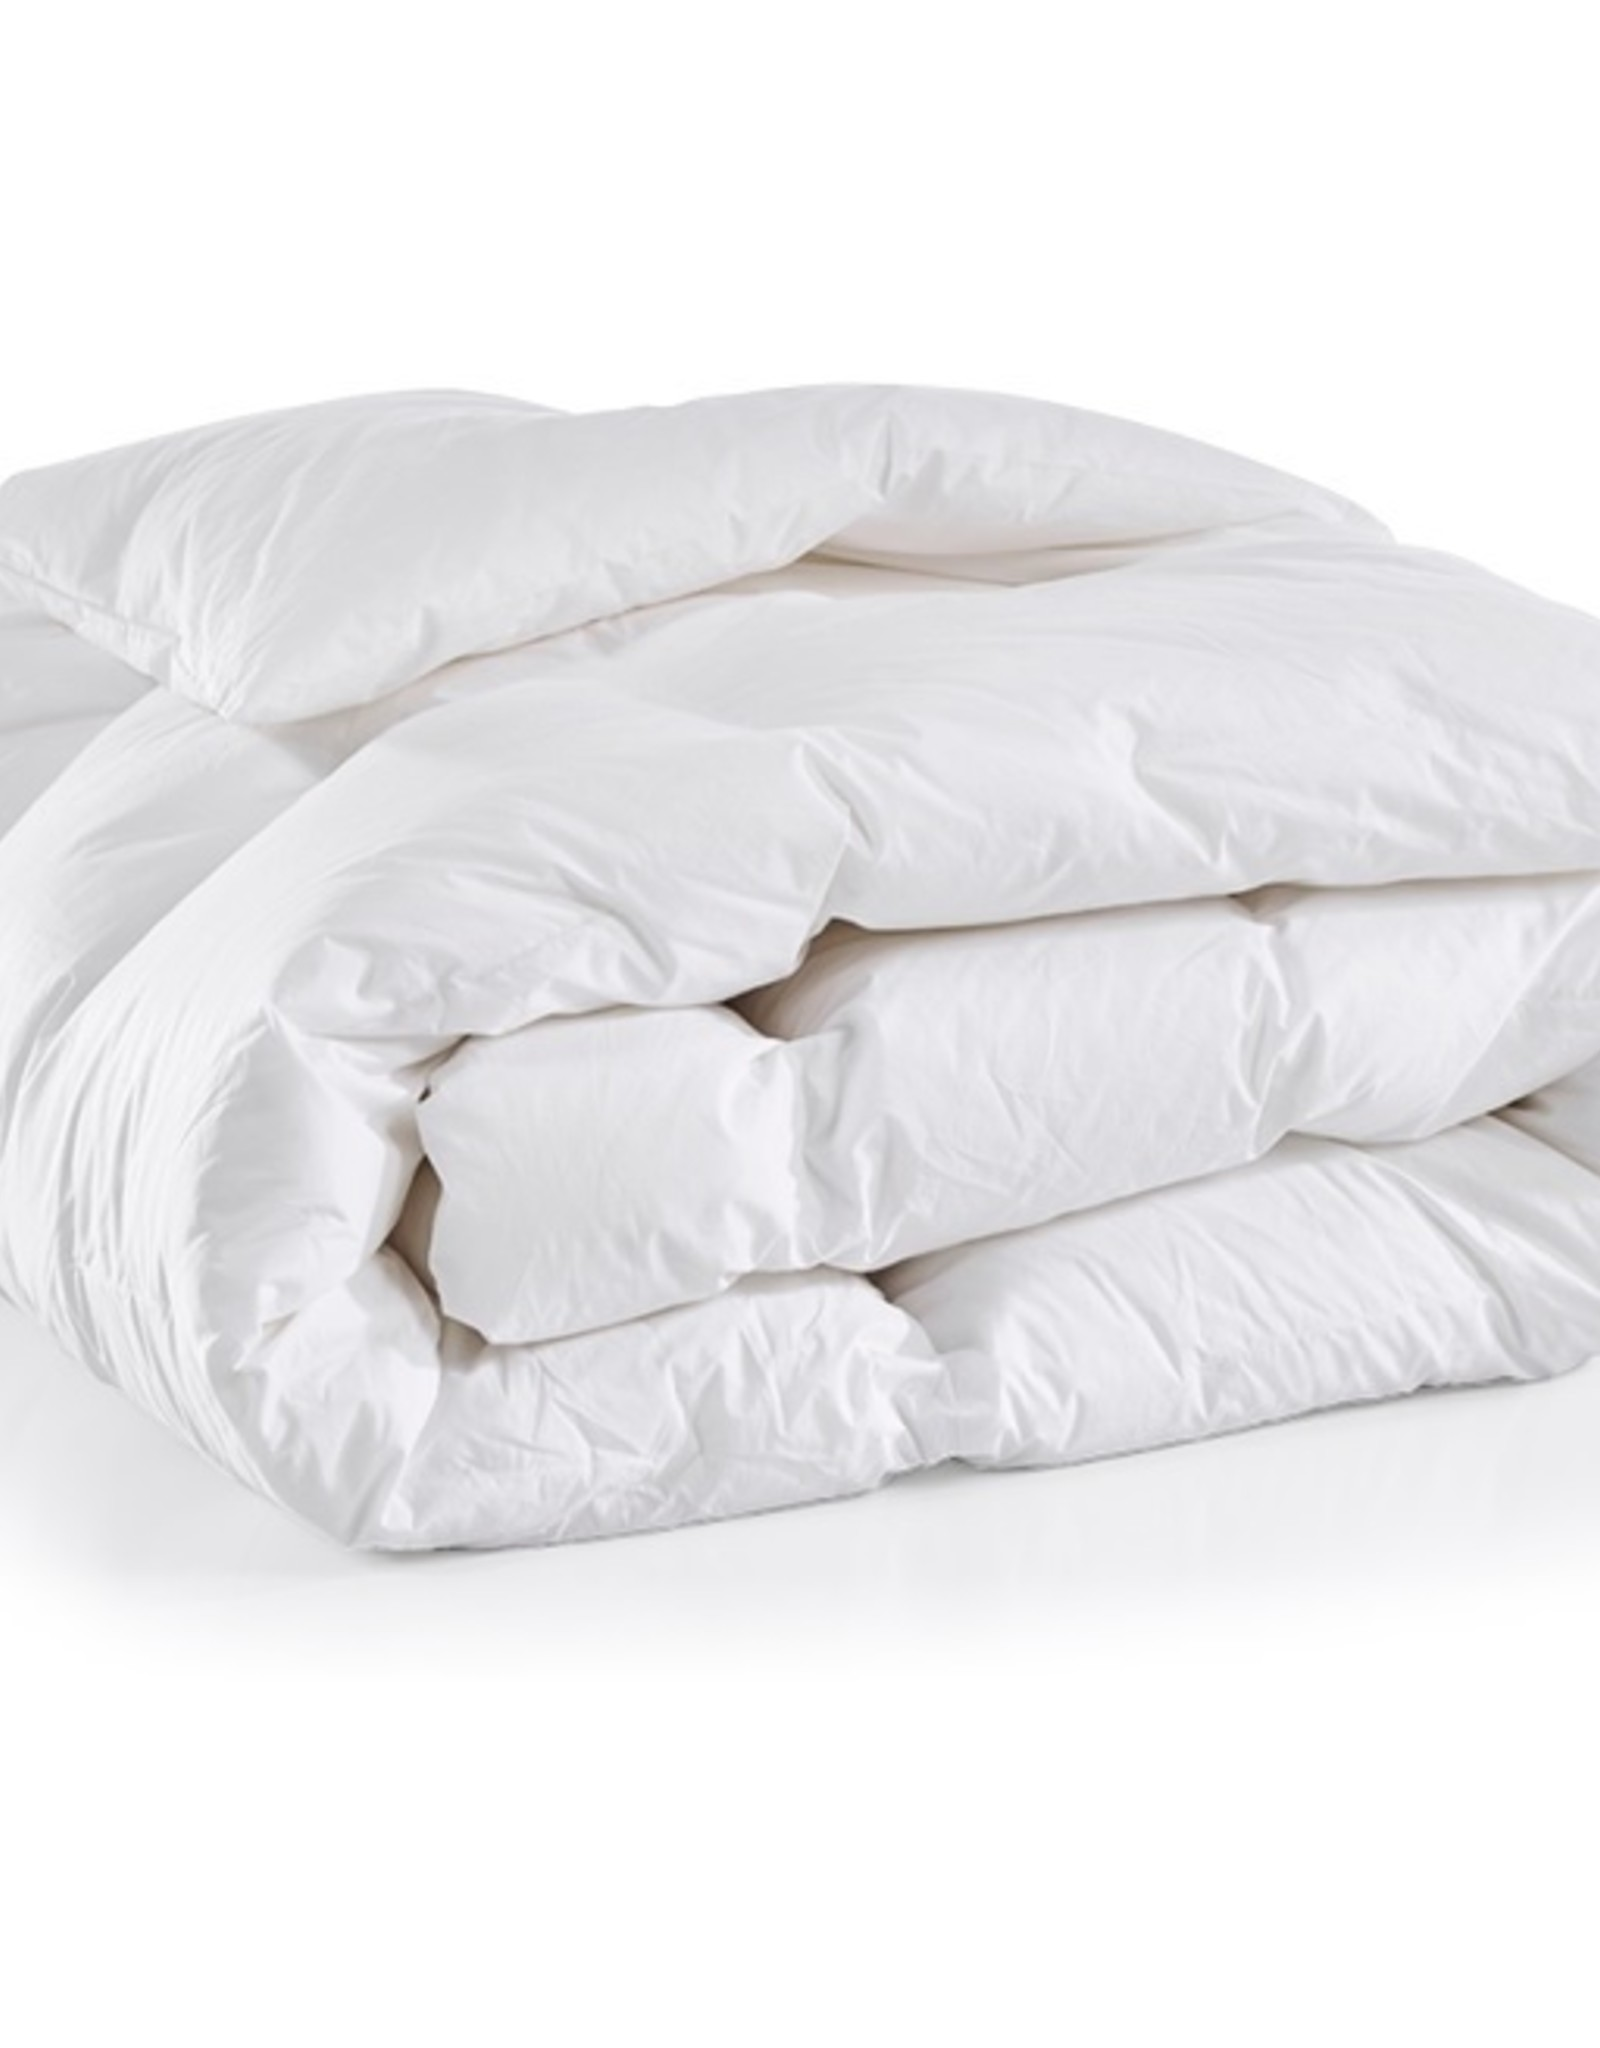 Sleepconsult Donsdeken Poolse 95% Winter